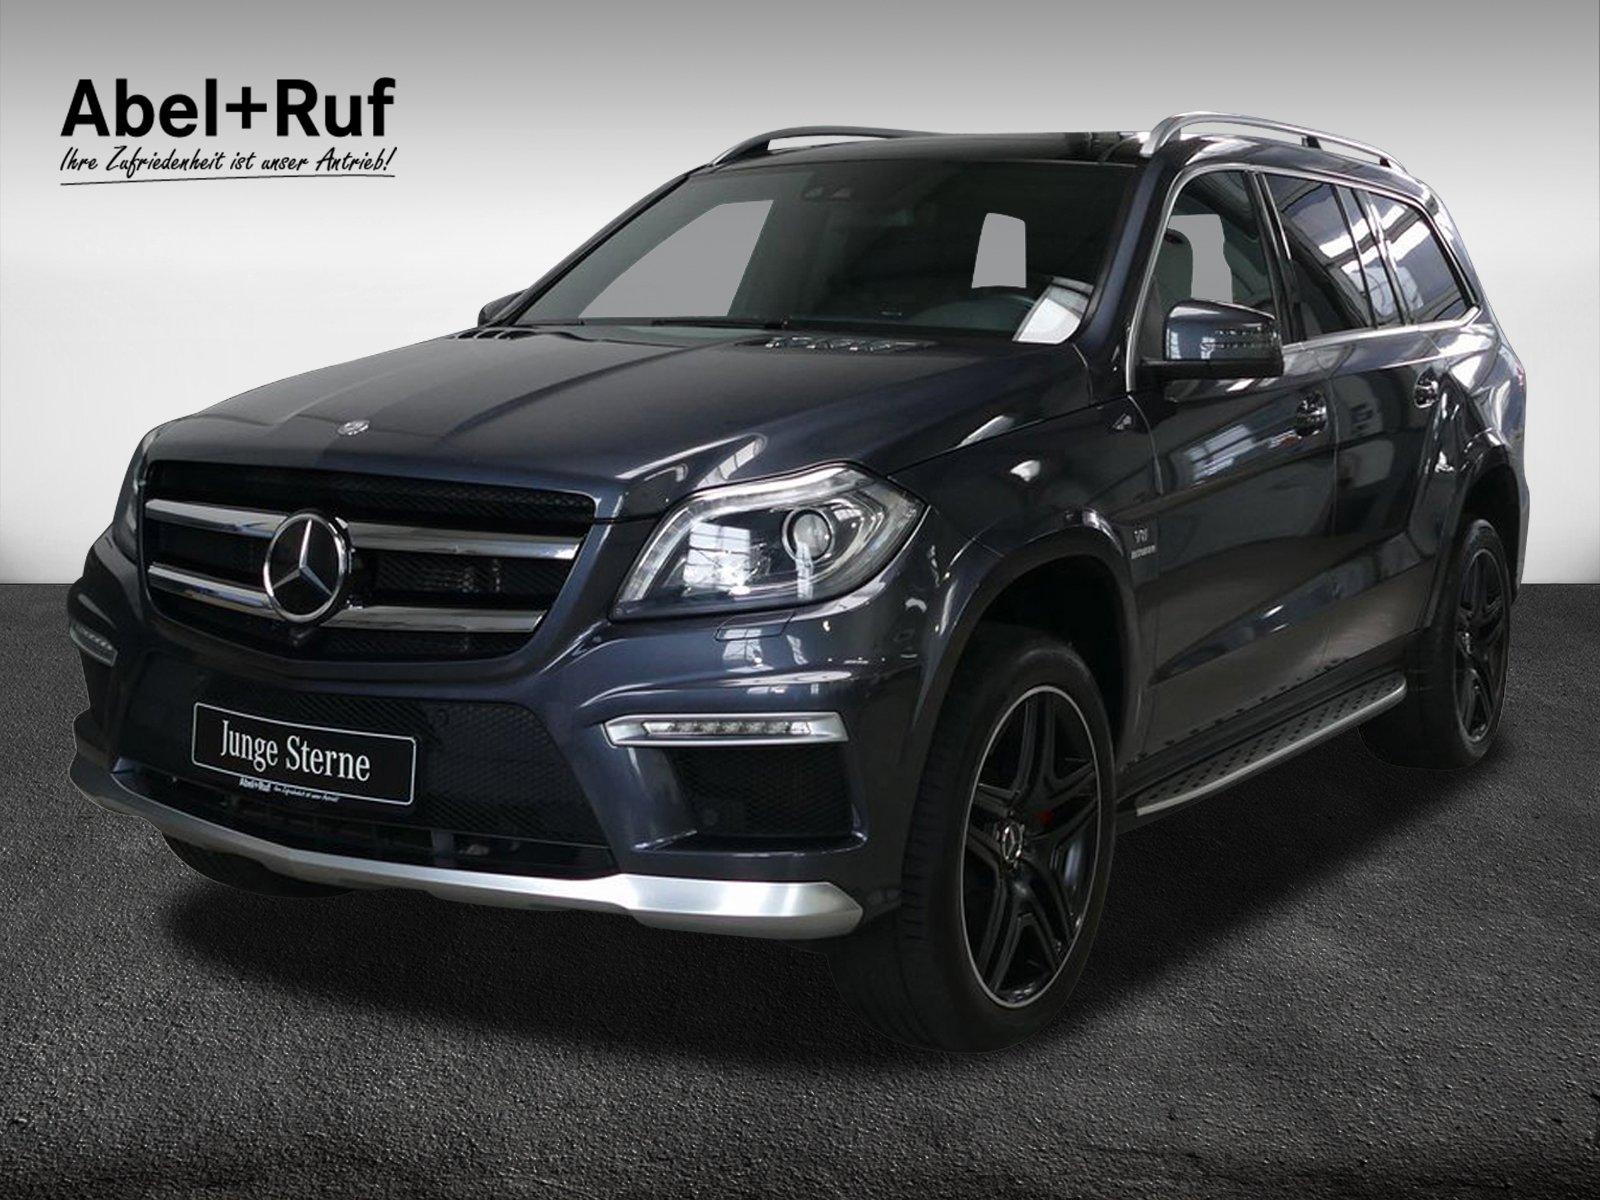 Mercedes-Benz GL 63 AMG+Distronic+Comand+Panorama+Standhzg+AHK, Jahr 2016, Benzin